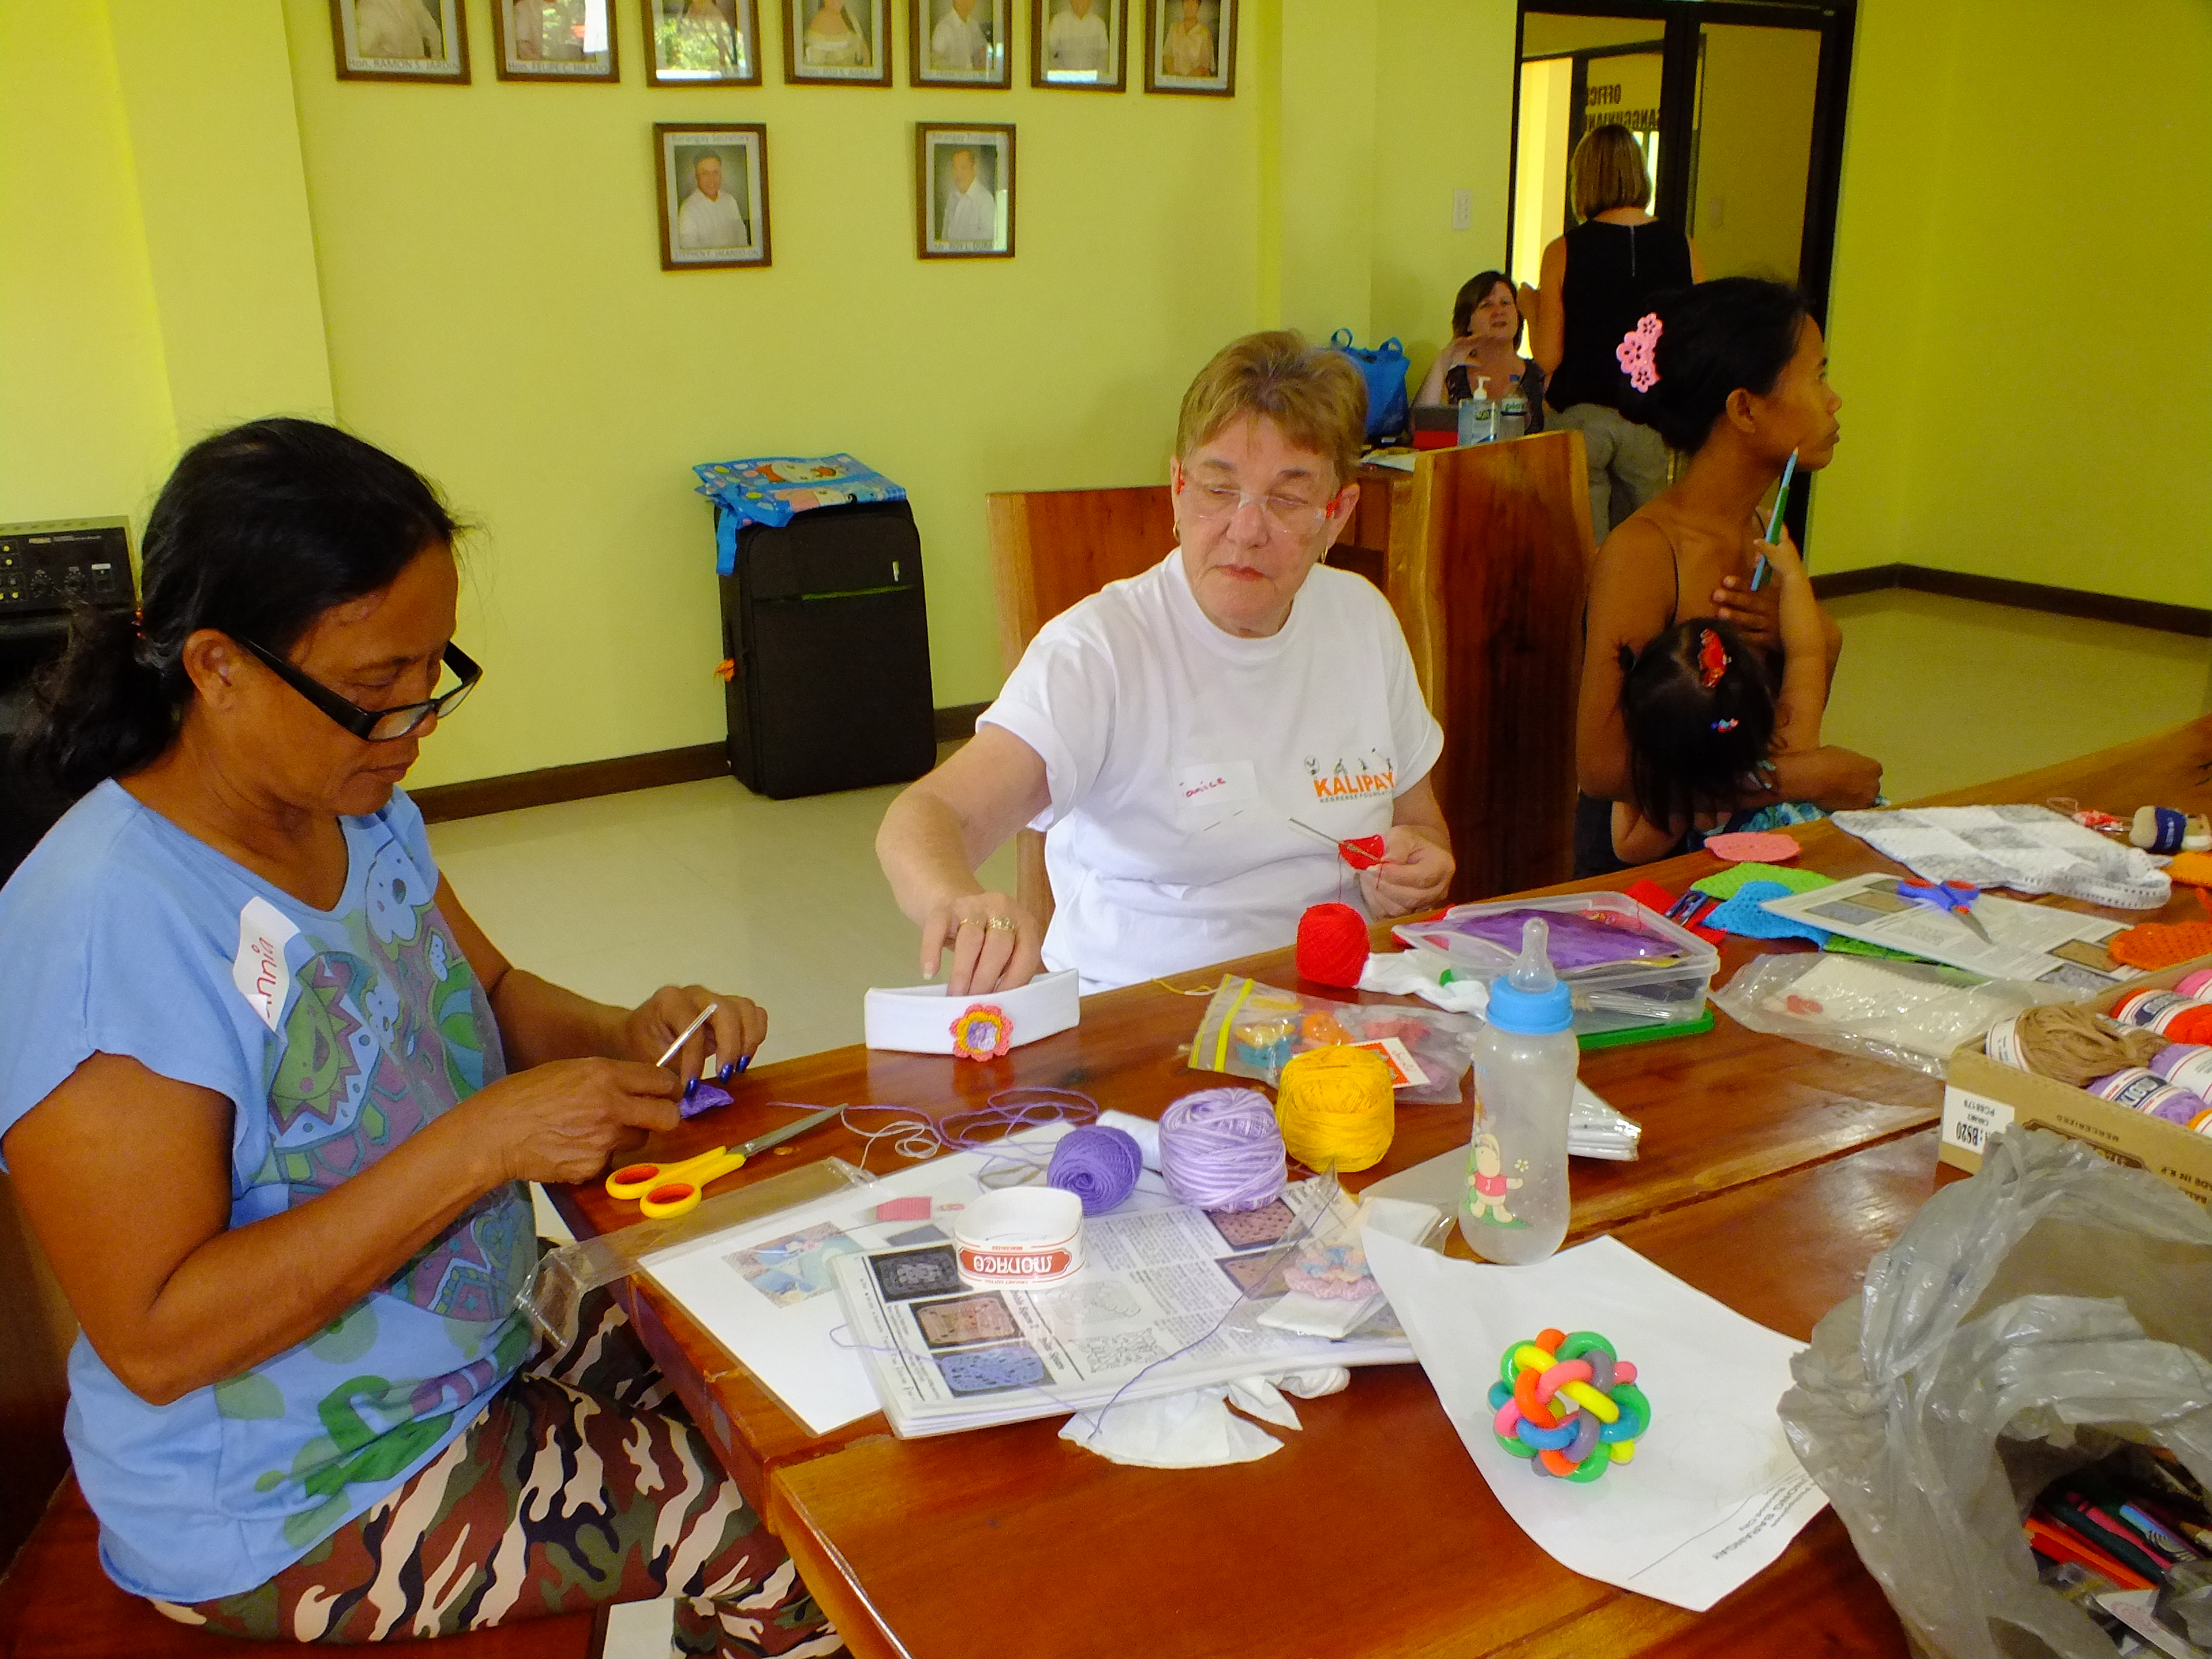 Volunteer craft educator in action